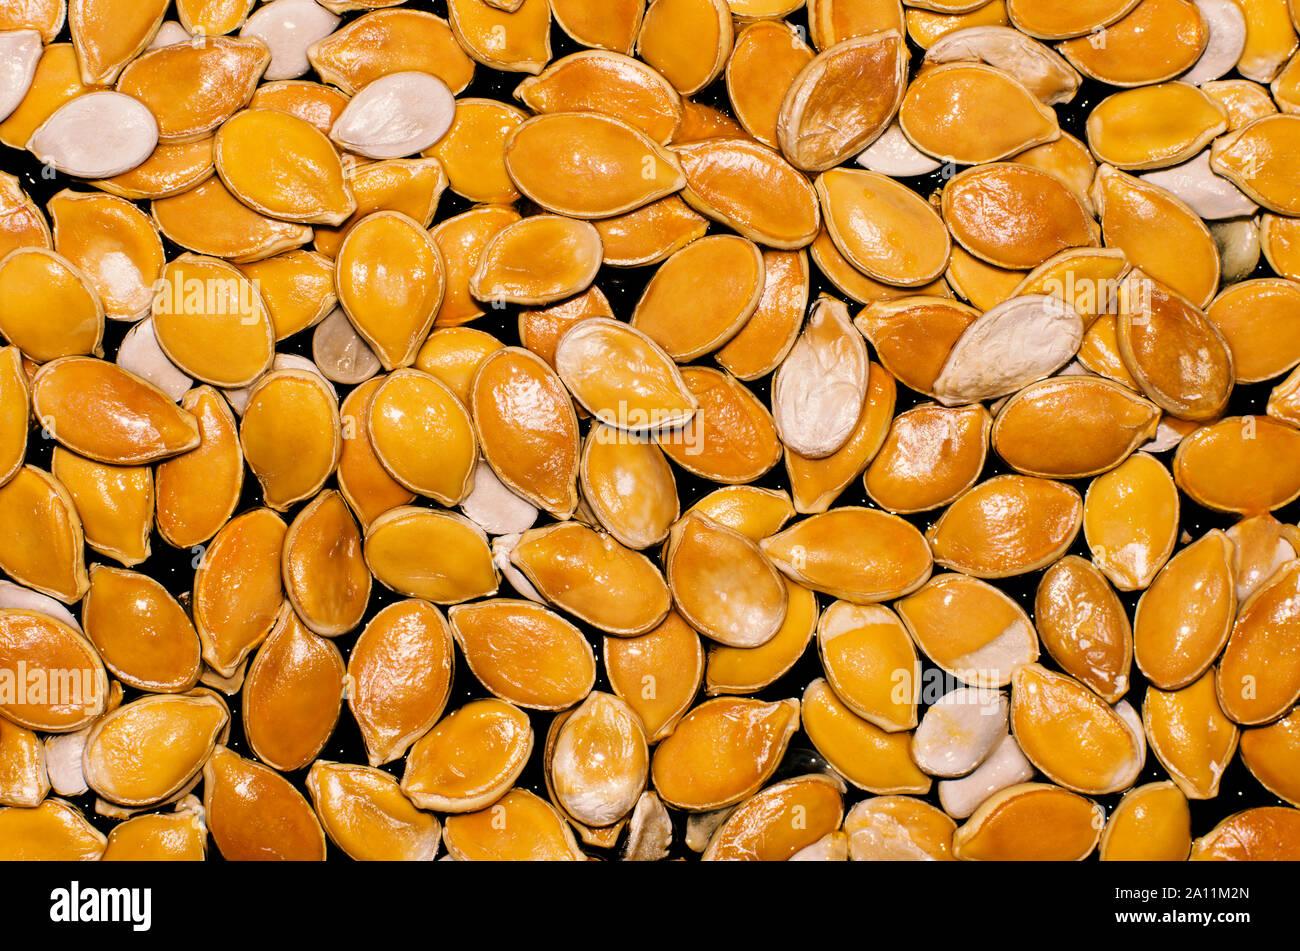 Shiny wet orange and white pumpkin seeds on a black background closeup Stock Photo